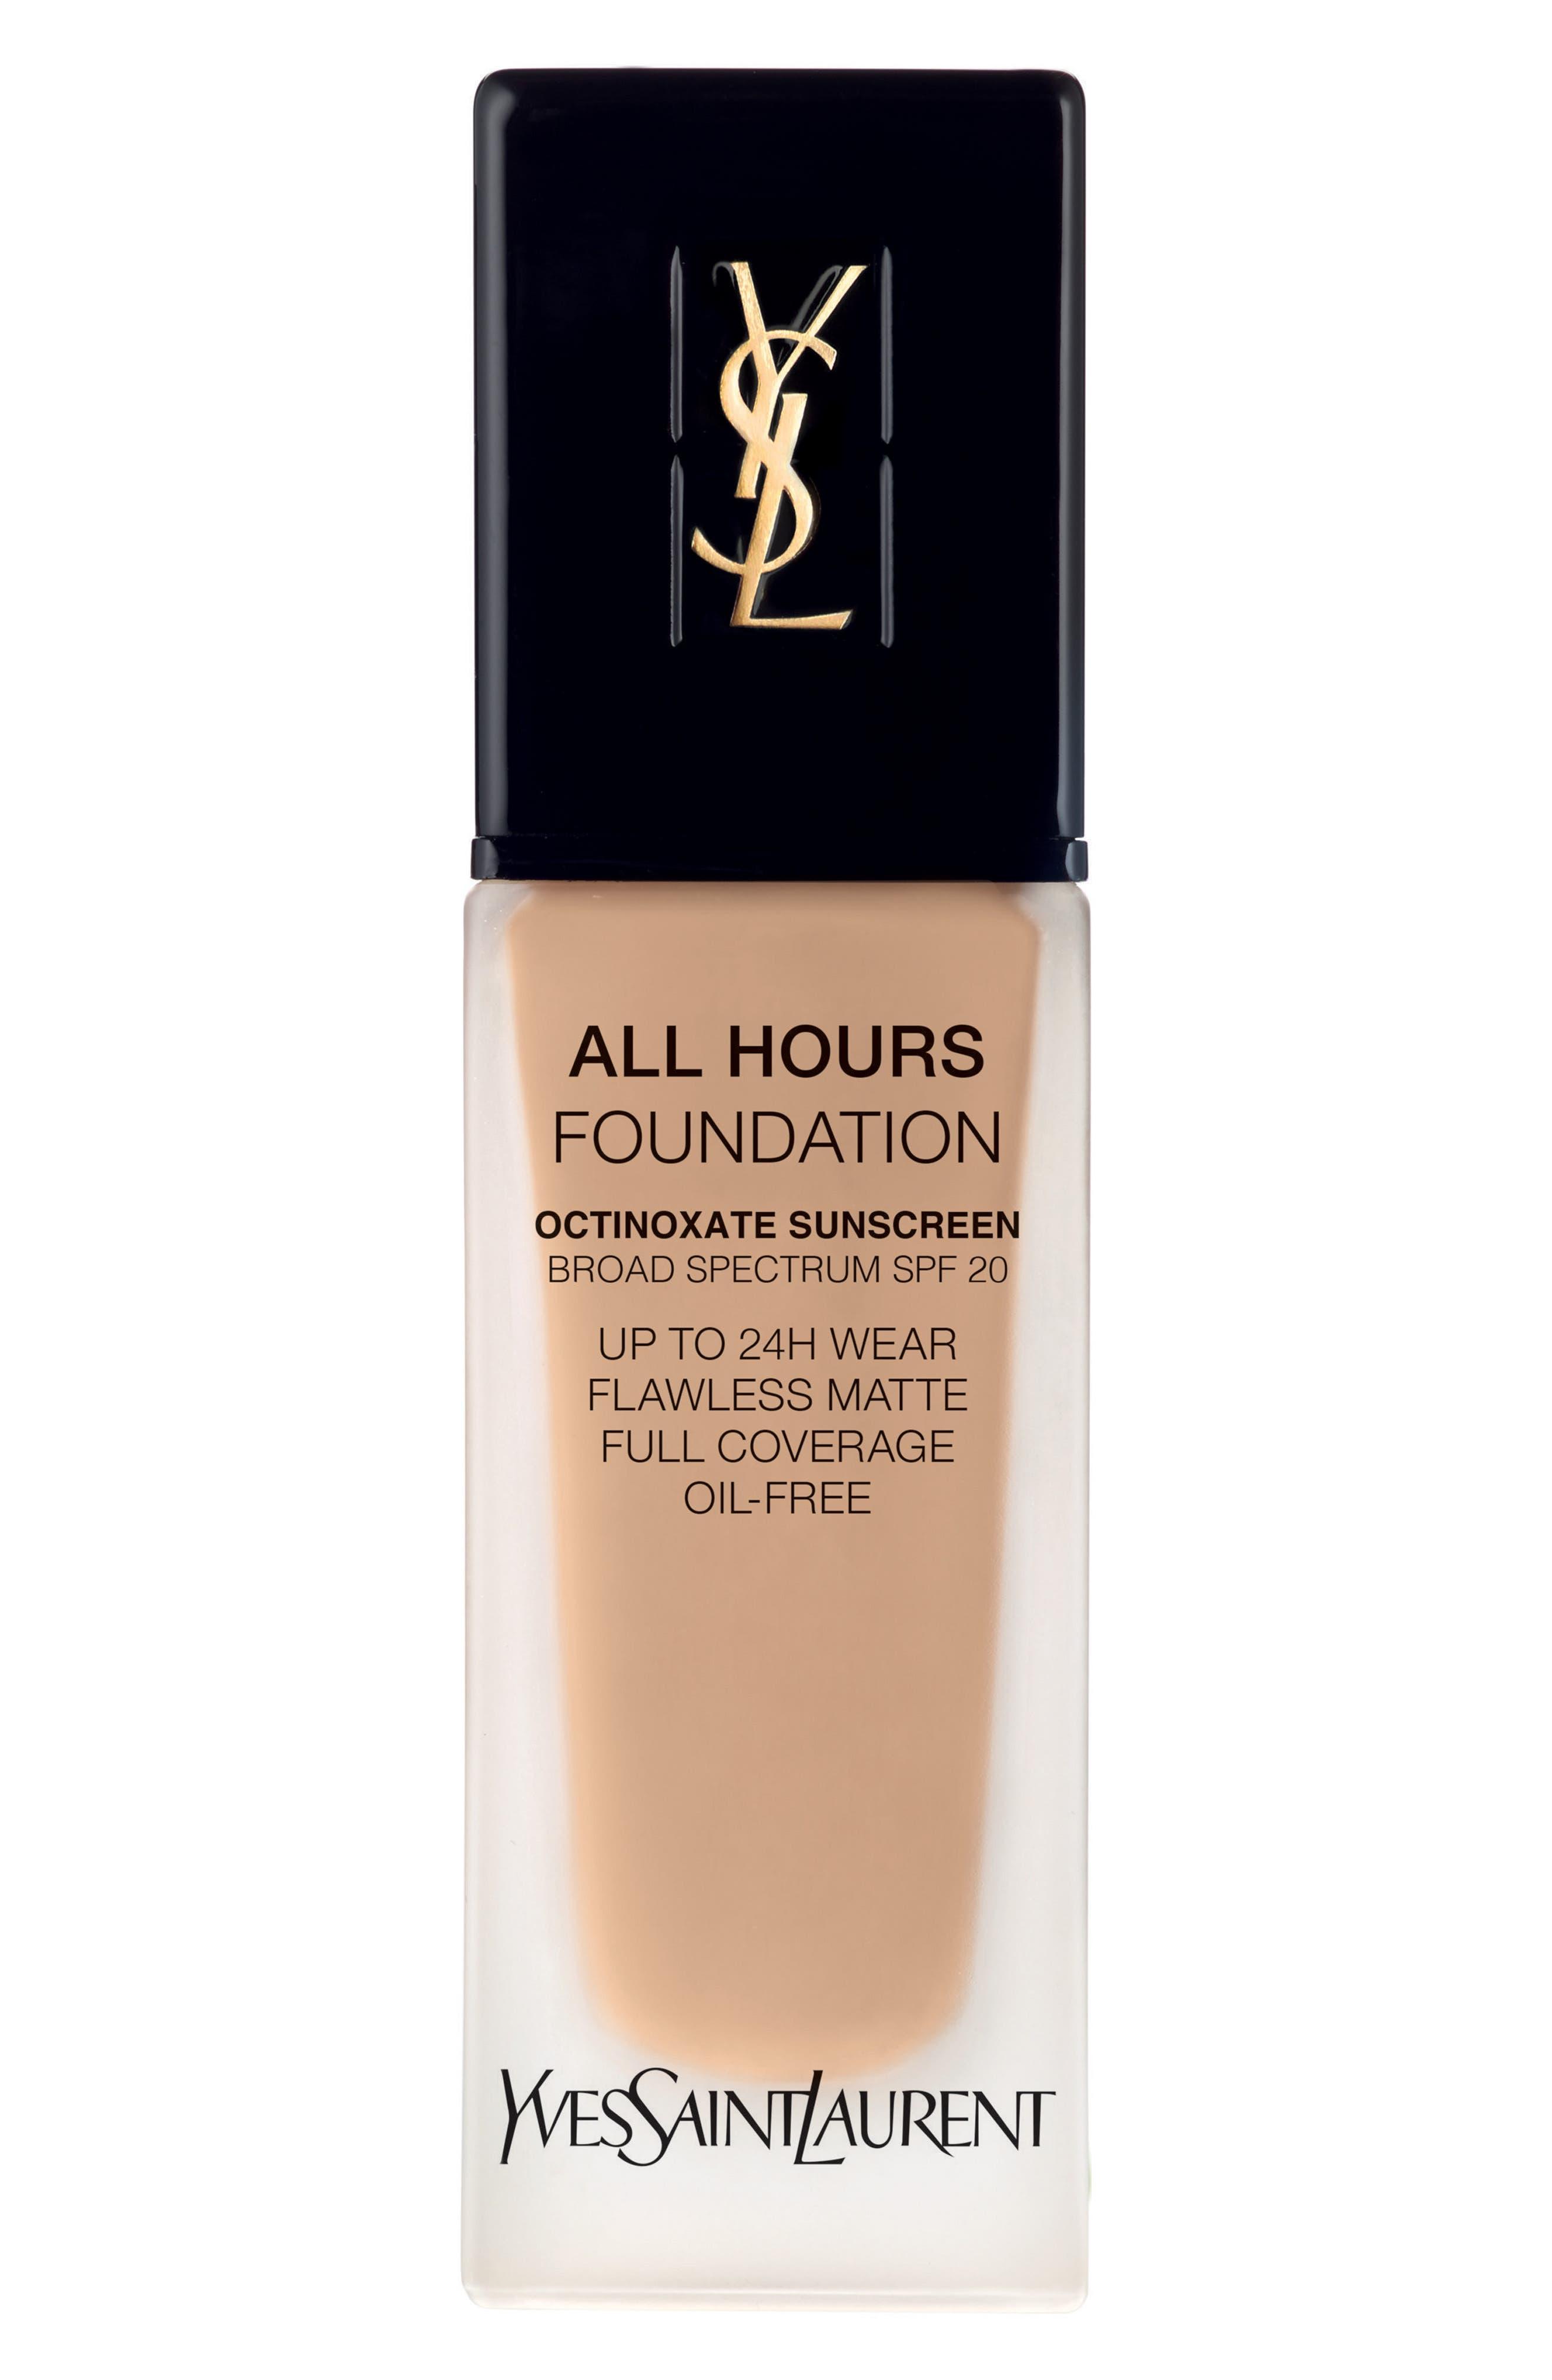 Yves Saint Laurent All Hours Full Coverage Matte Foundation Spf 20 - Bd30 Warm Almond